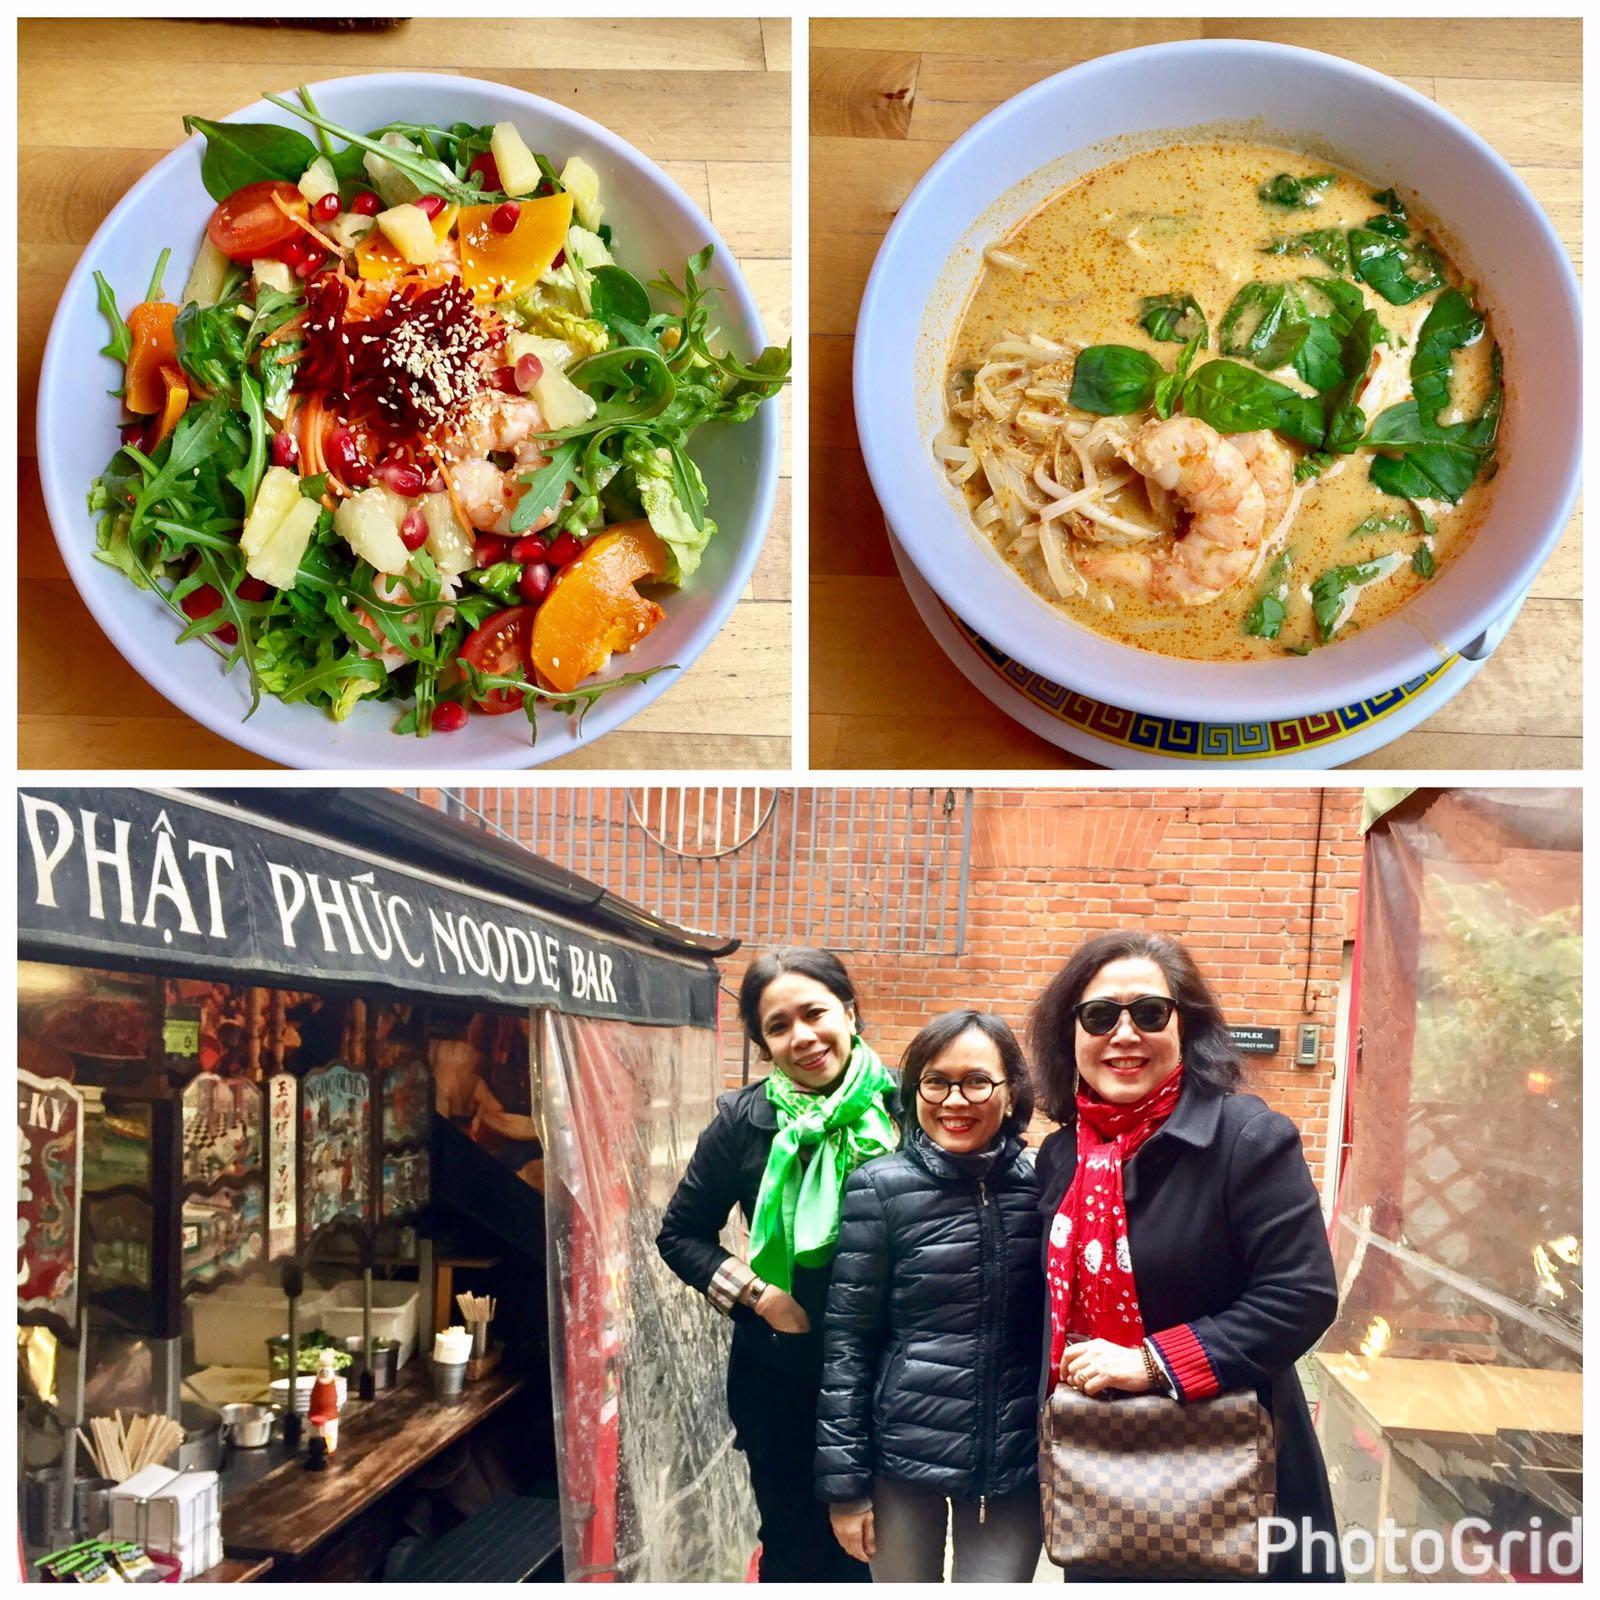 Vietnamese- Phat Phuk Noodle Bar, Chelsea, London